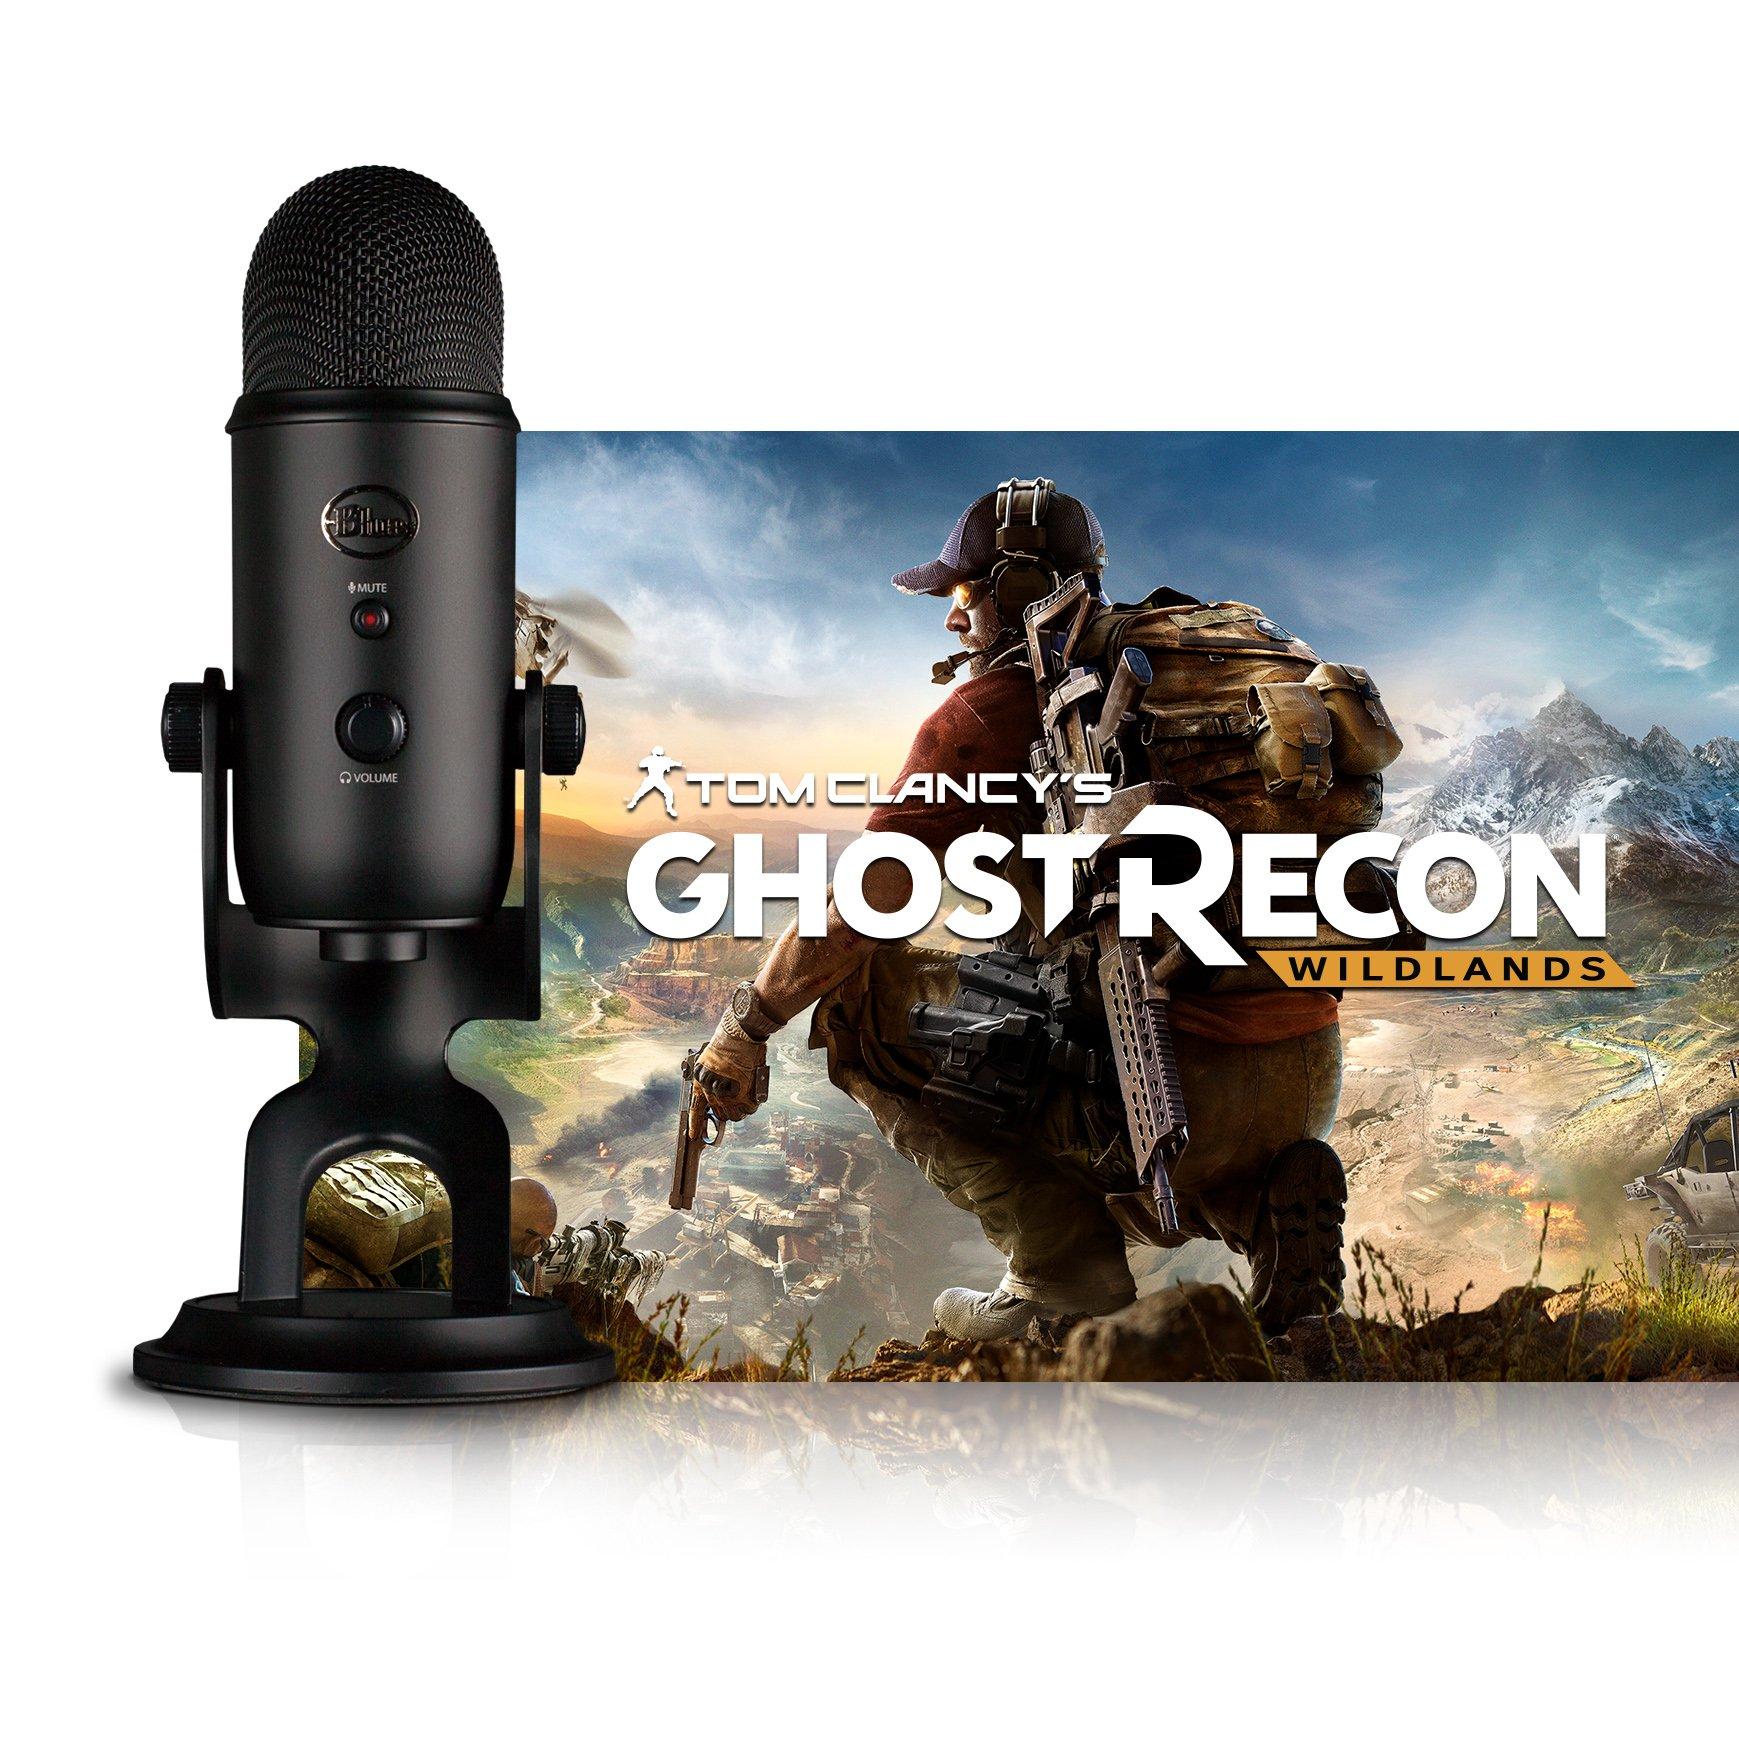 Blue Blackout Yeti + Tom Clancy's Ghost Recon Wildlands PC: Streamer Bundle